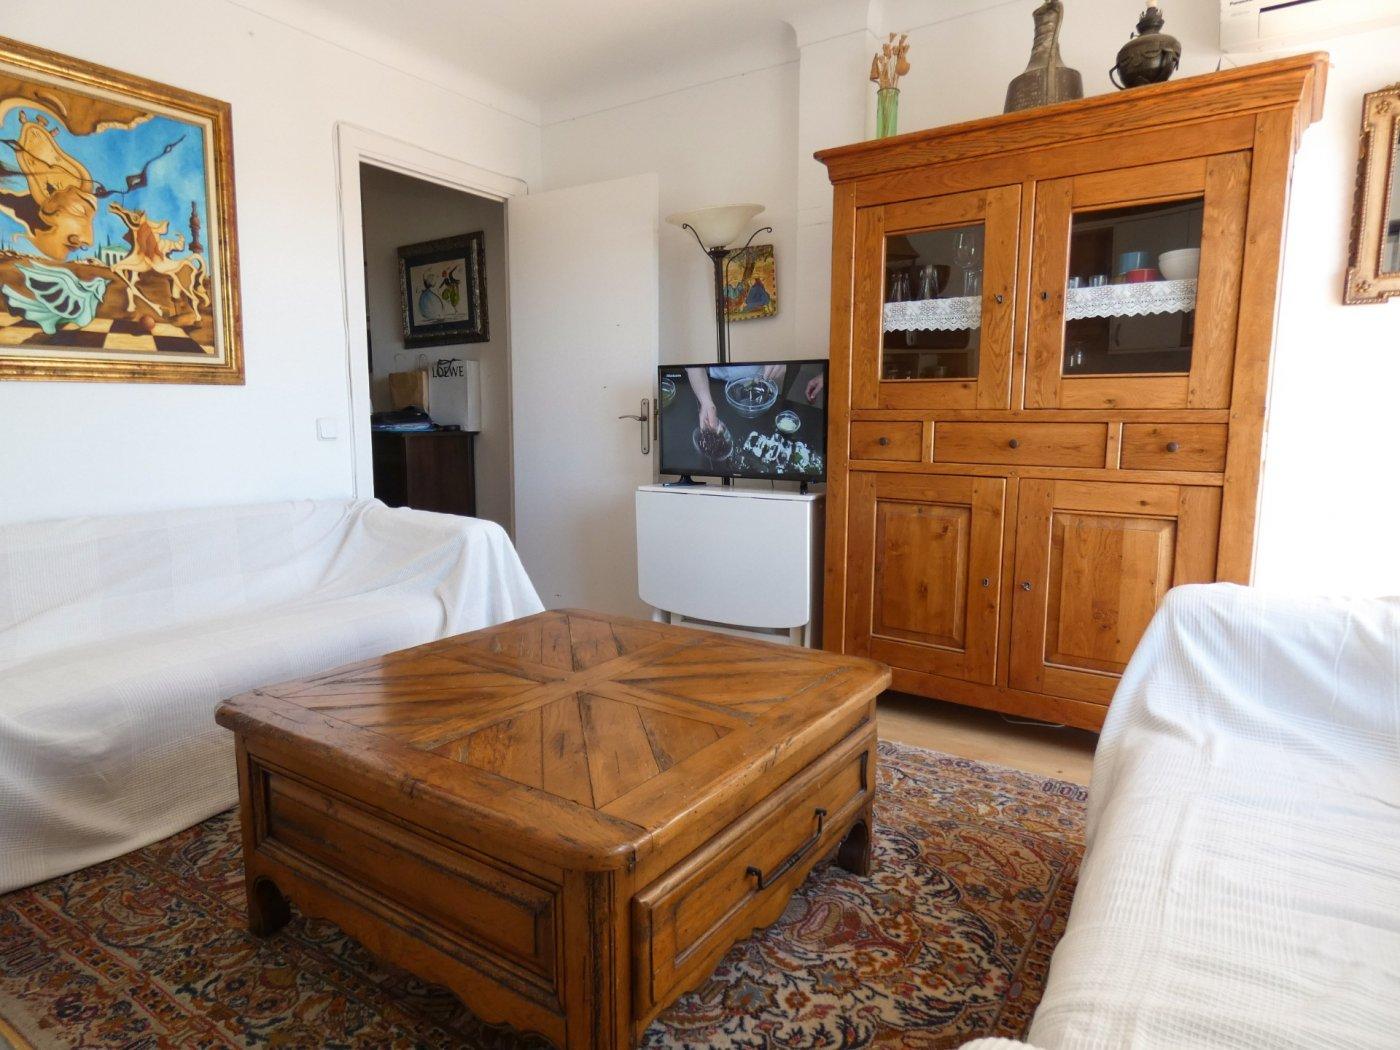 Despacho-Venta-Palma de Mallorca-185572-Foto-20